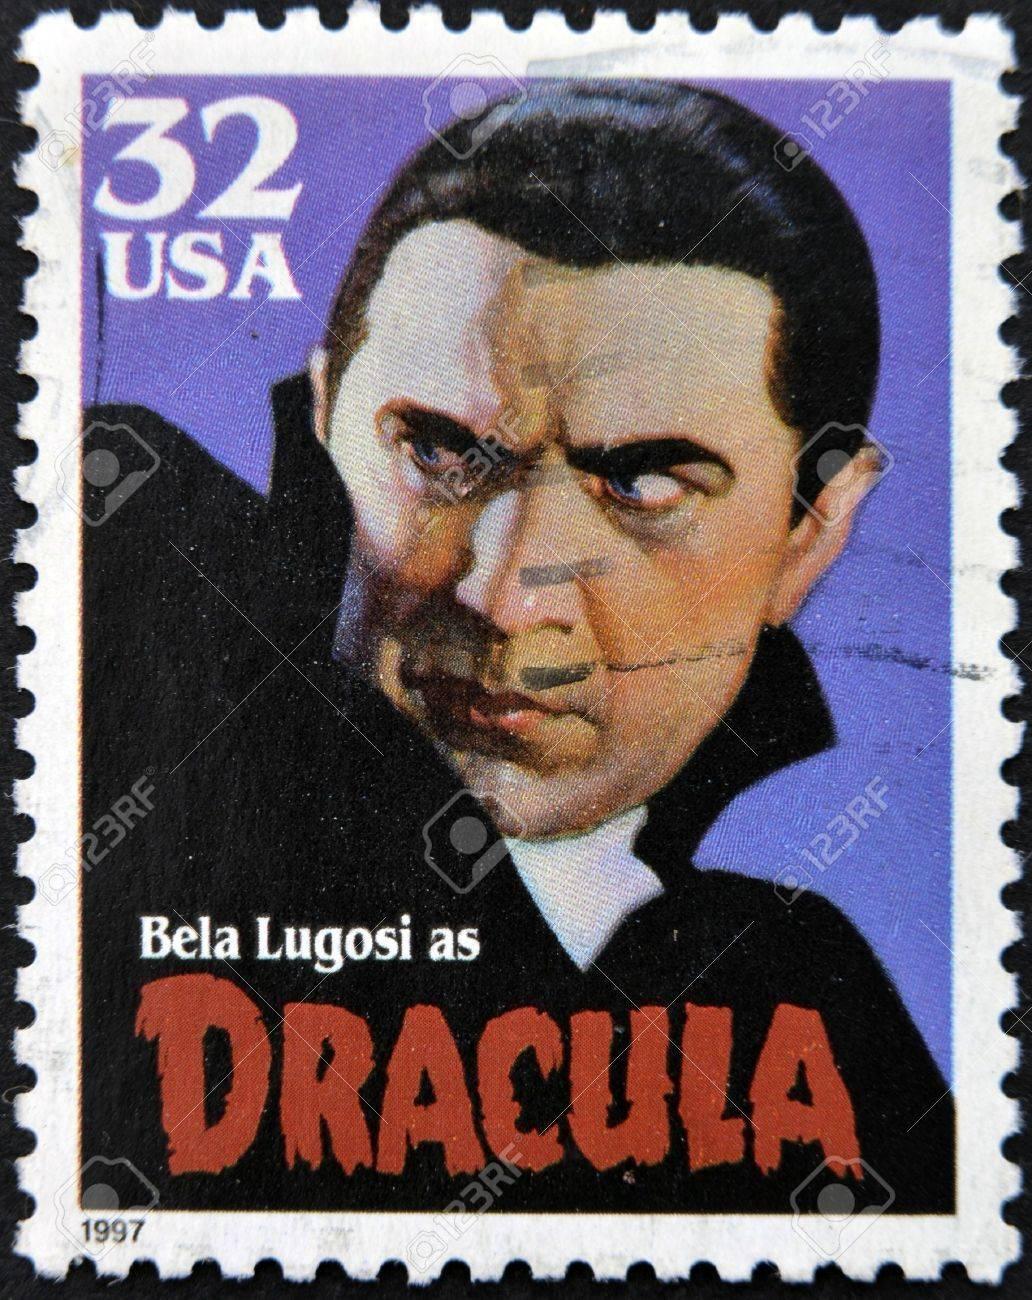 UNITED STATES OF AMERICA - CIRCA 1997: A stamp printed in USA shows Bela Lugosi as Dracula, circa 1997 Stock Photo - 13749307